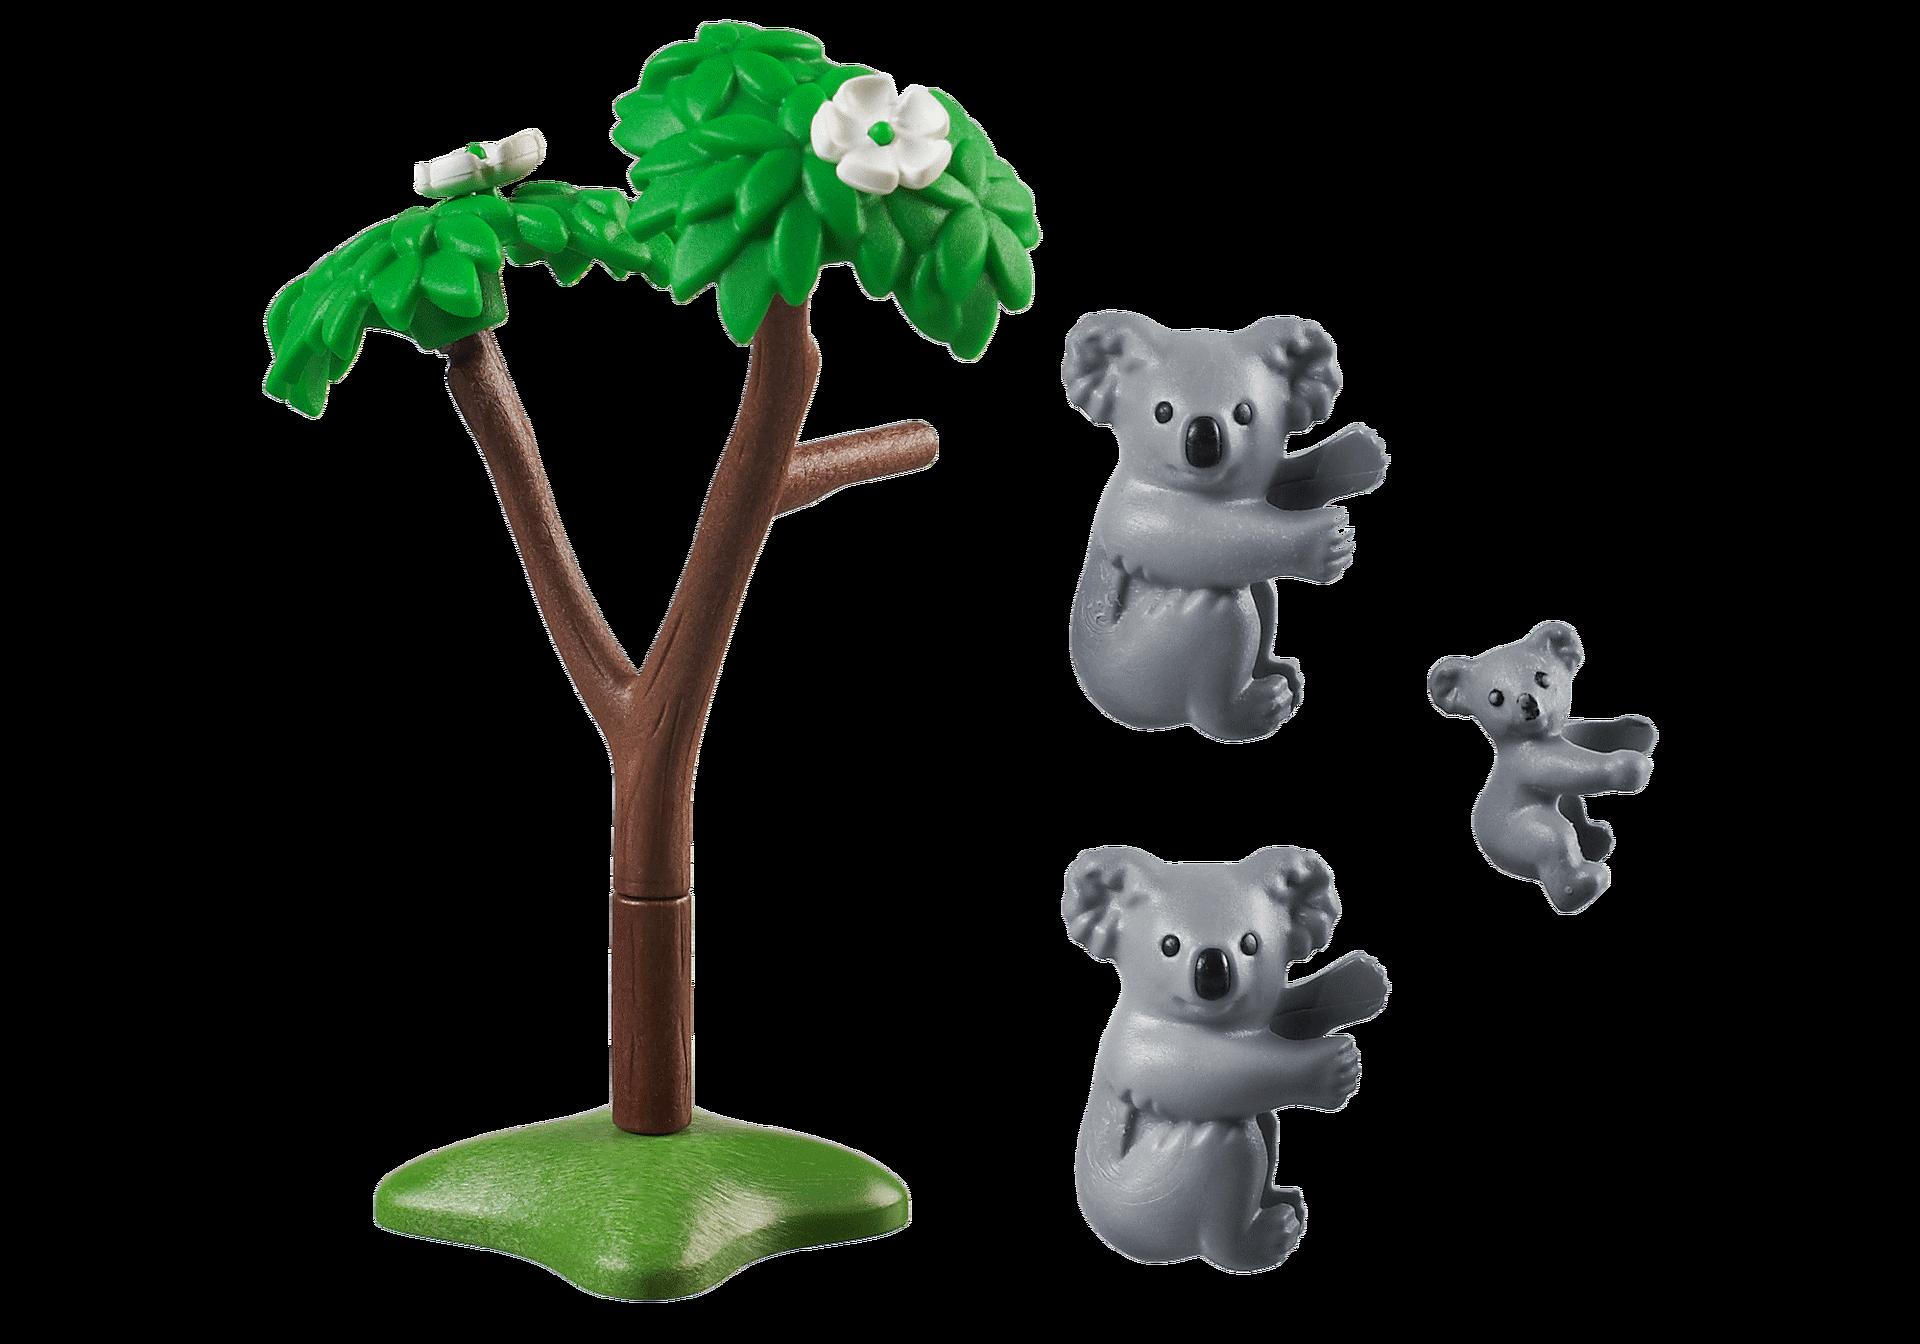 70352 2 Koala's met baby zoom image3